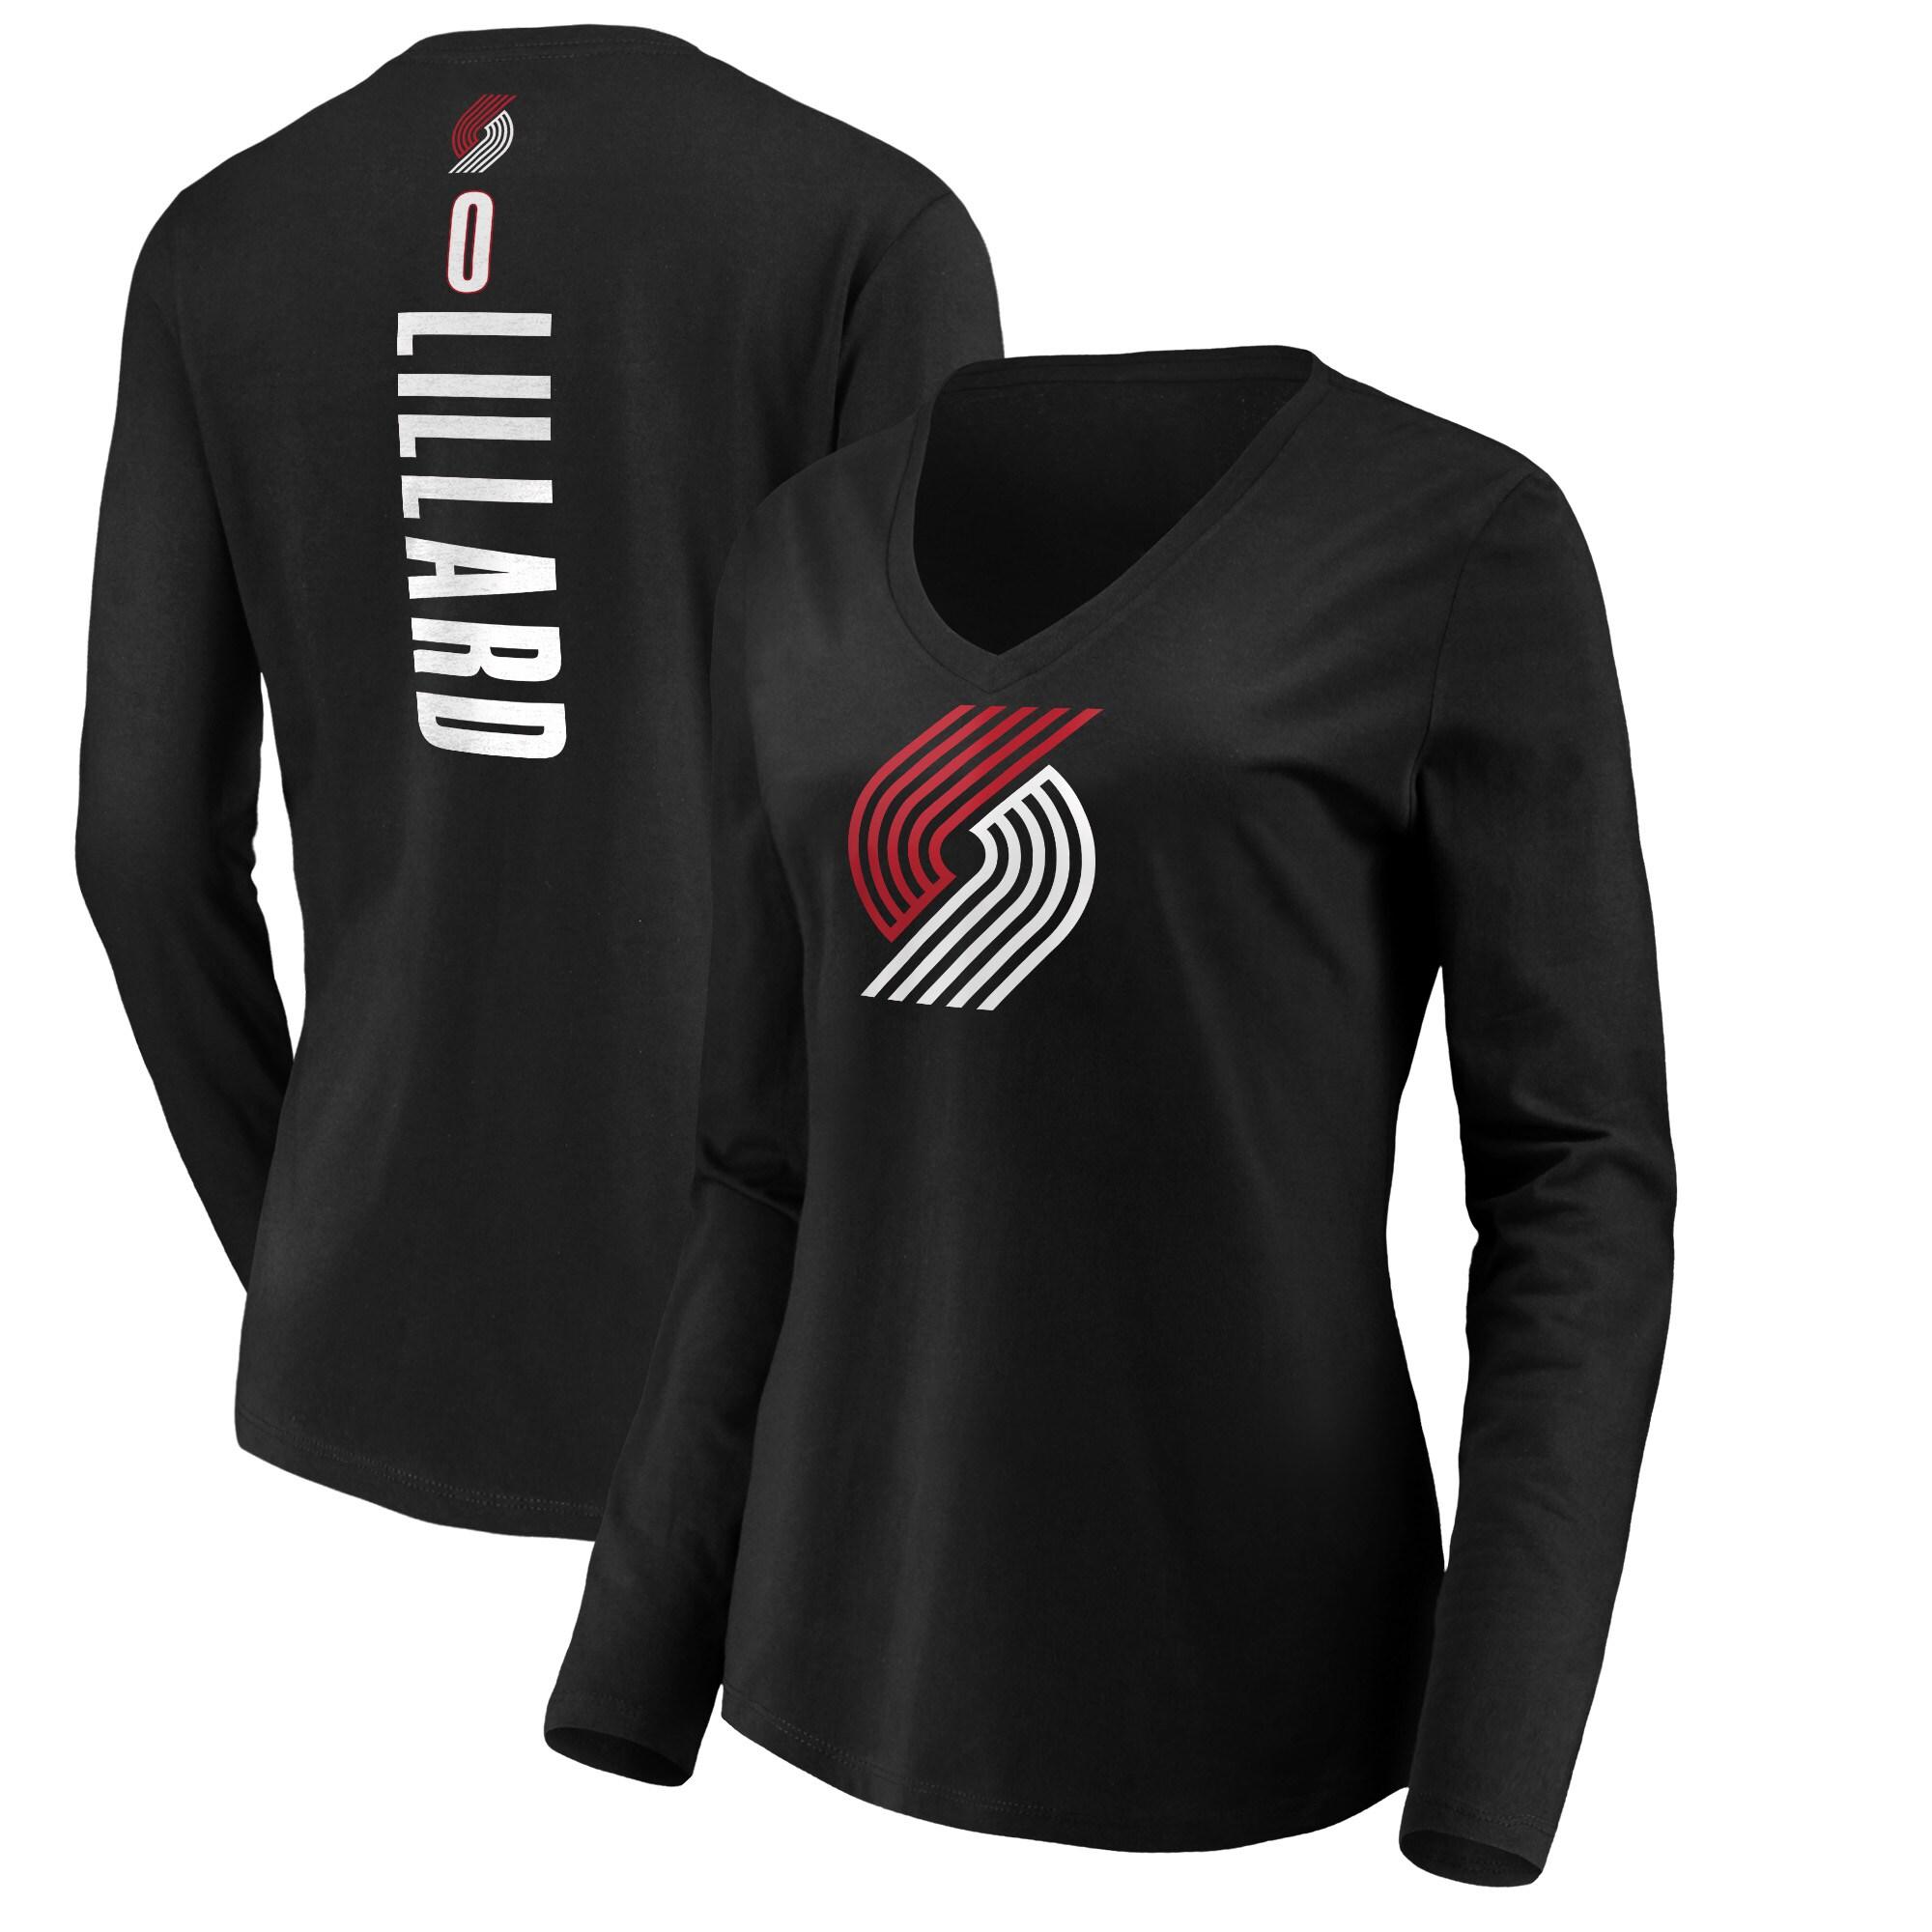 Damian Lillard Portland Trail Blazers Fanatics Branded Women's Playmaker Name & Number Long Sleeve V-Neck T-Shirt - Black